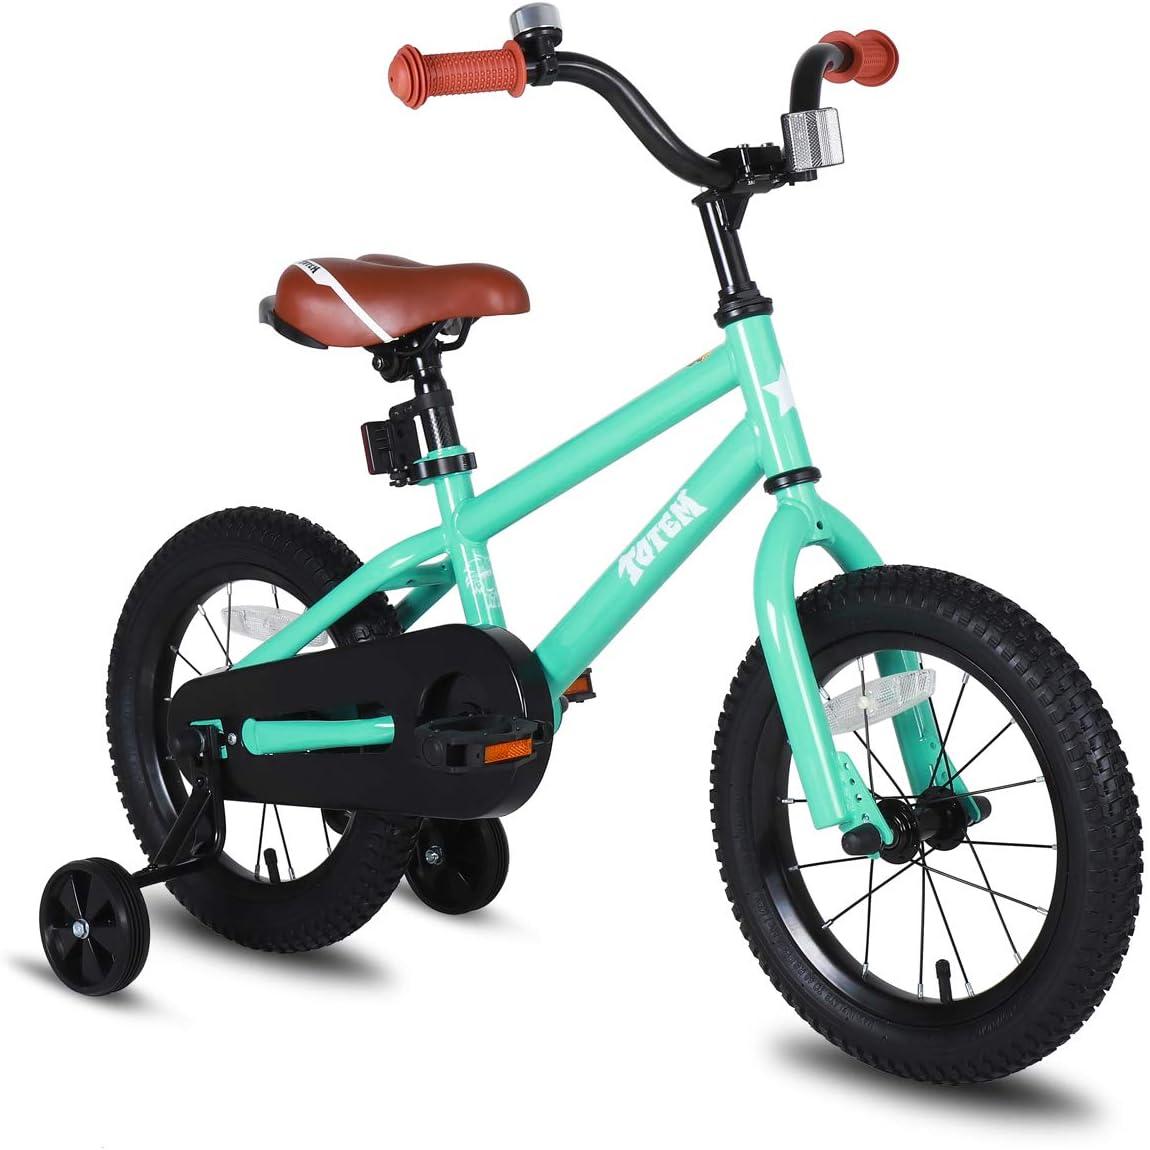 Kickstand for 18 inch Bike Blue Ivory Red Orange Pink Green JOYSTAR Totem Kids Bike with Training Wheels for 12 14 16 inch Bike